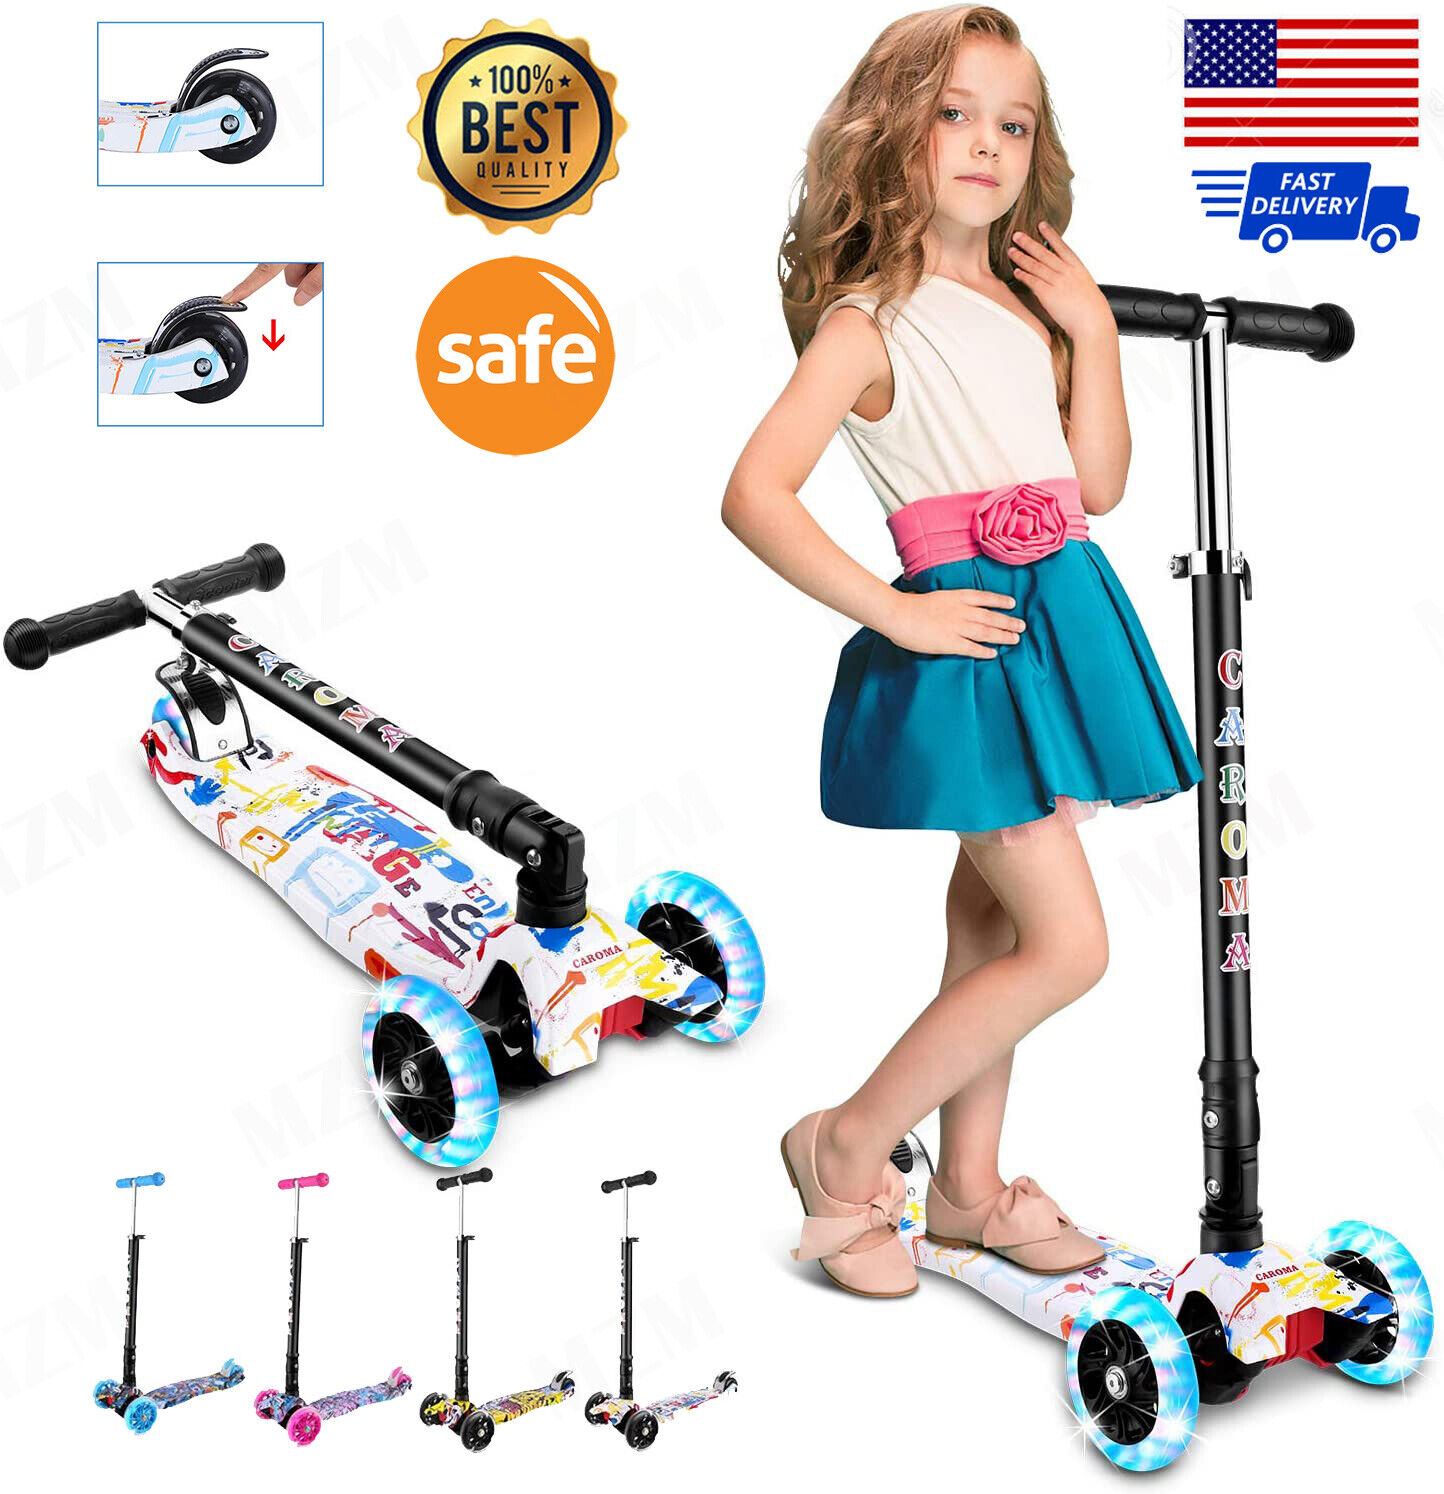 Lightweight Kick Scooter 2 Wheel Fordable Kid/Adult Ride Adj